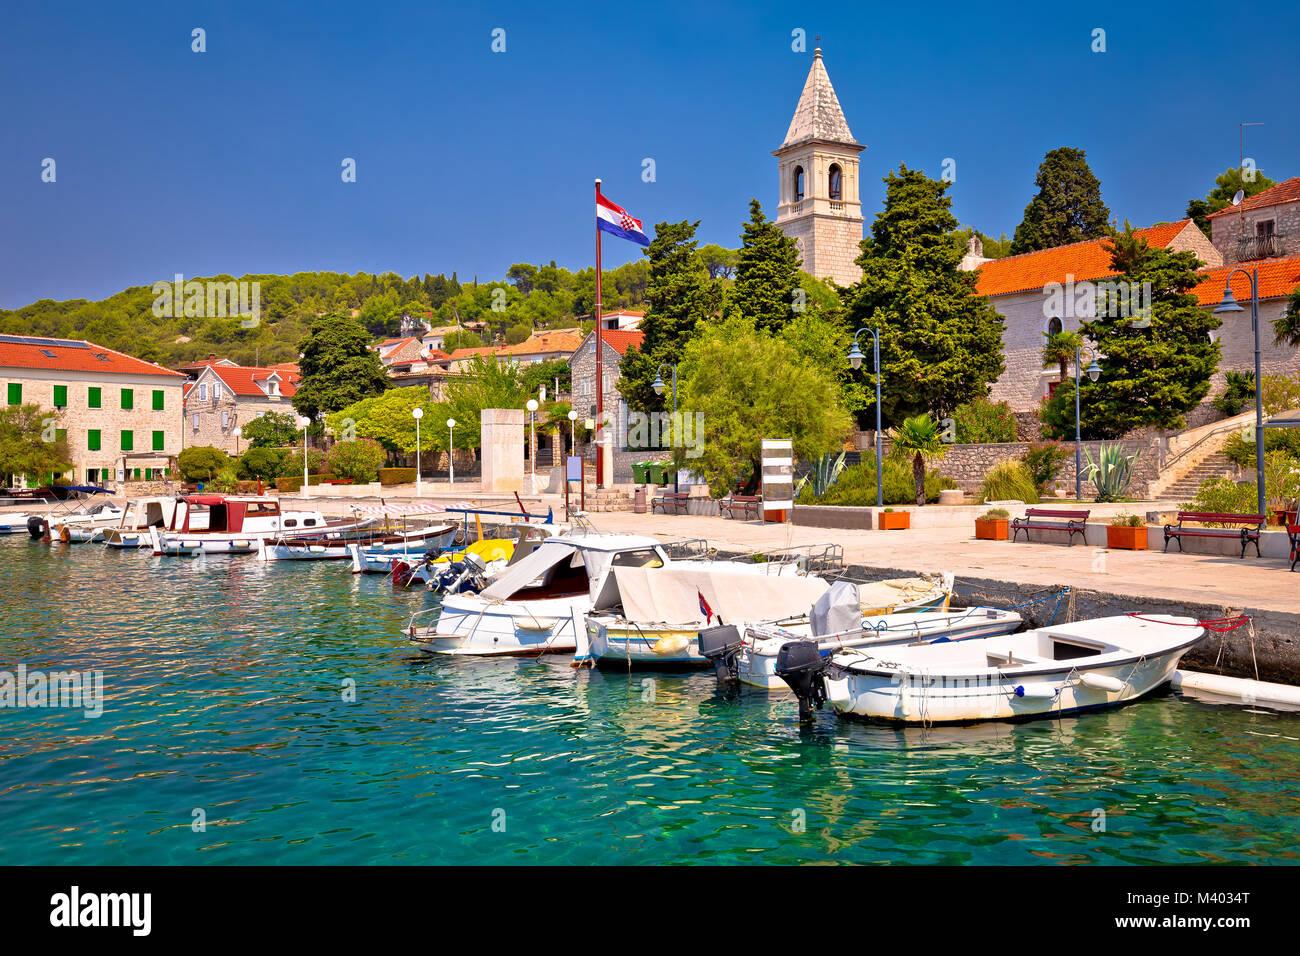 Prvic Luka island village waterfront view, Sibenik archipelago of Dalmatia, Croatia - Stock Image